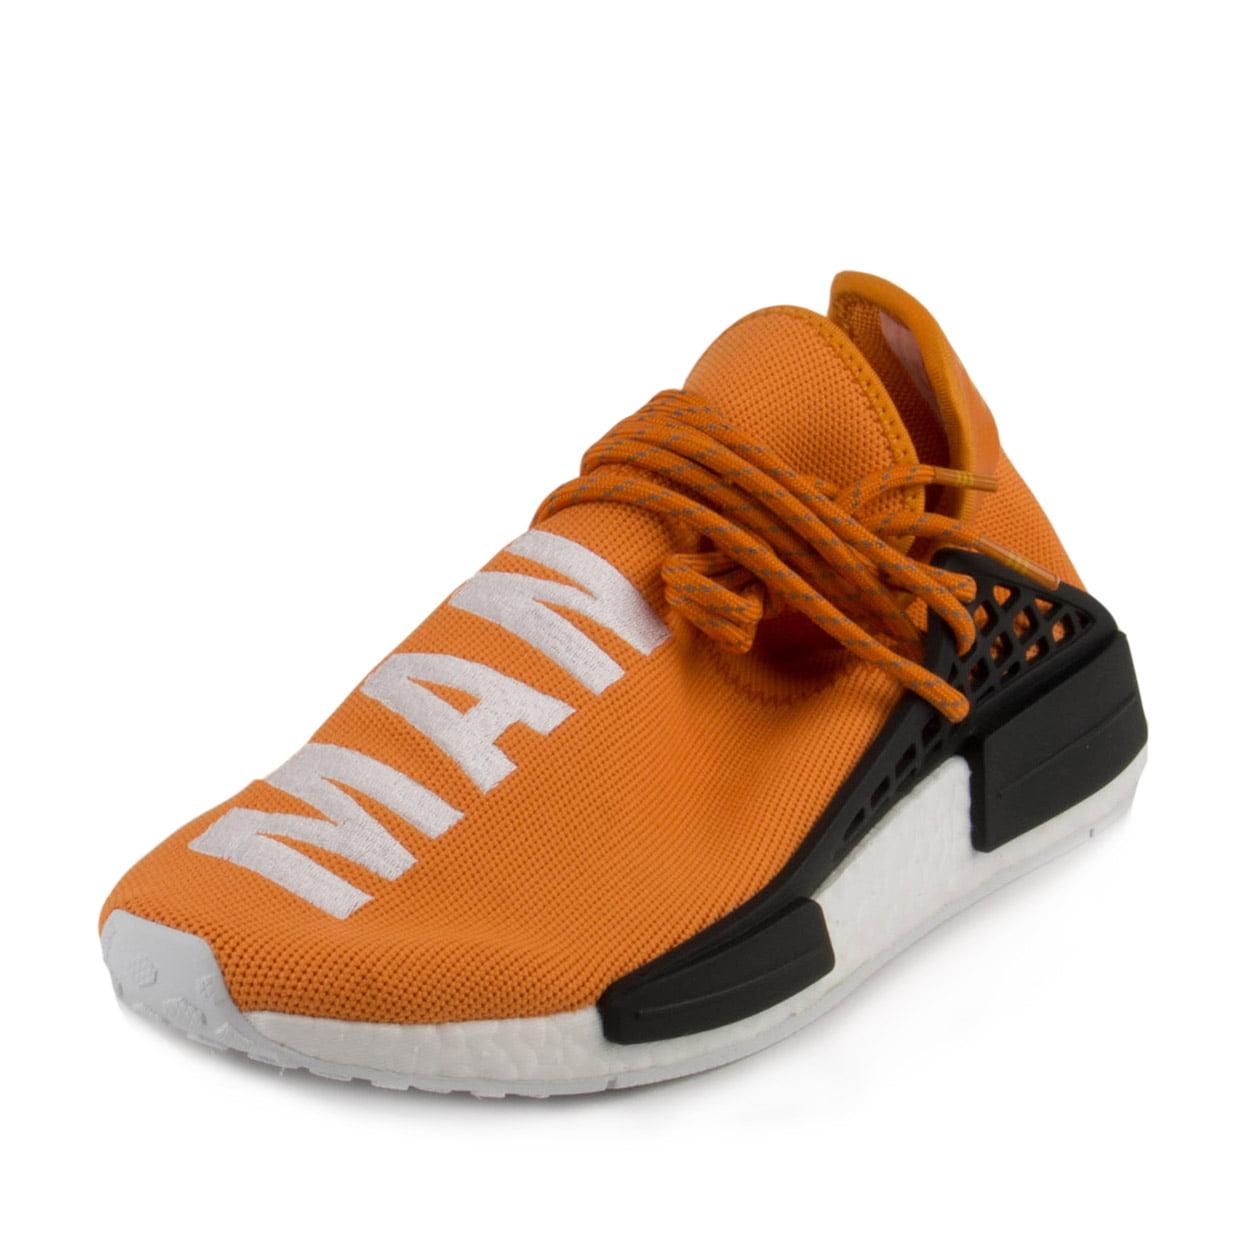 Adidas Mens PW Human Race NMD Tanger/Black BB3070